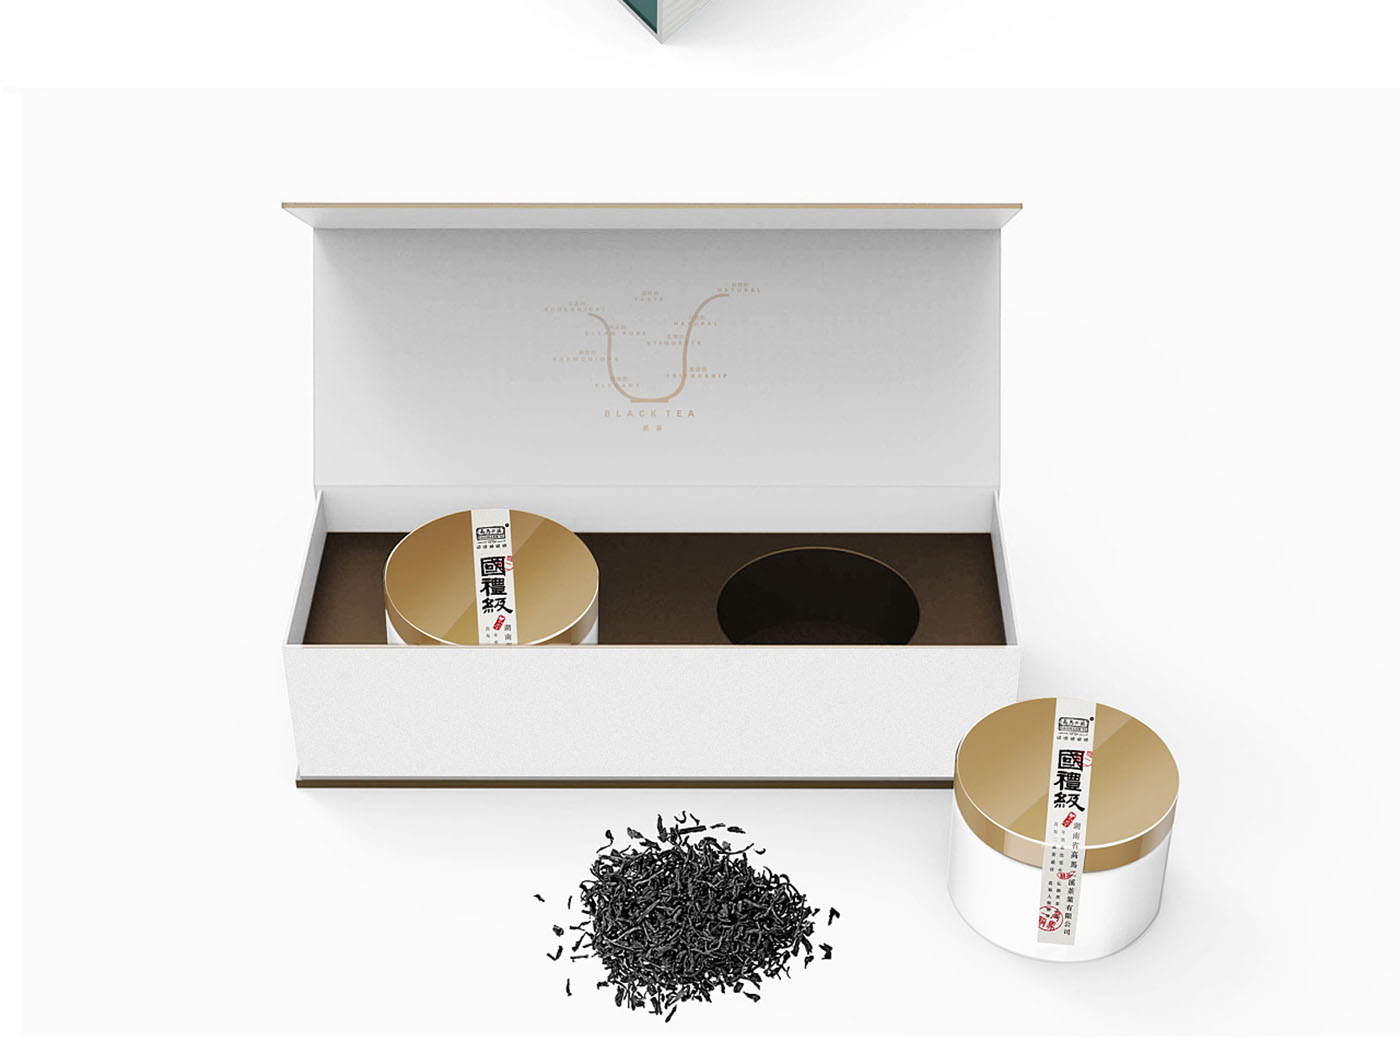 茶叶包装设计,高端茶叶包装设计公司